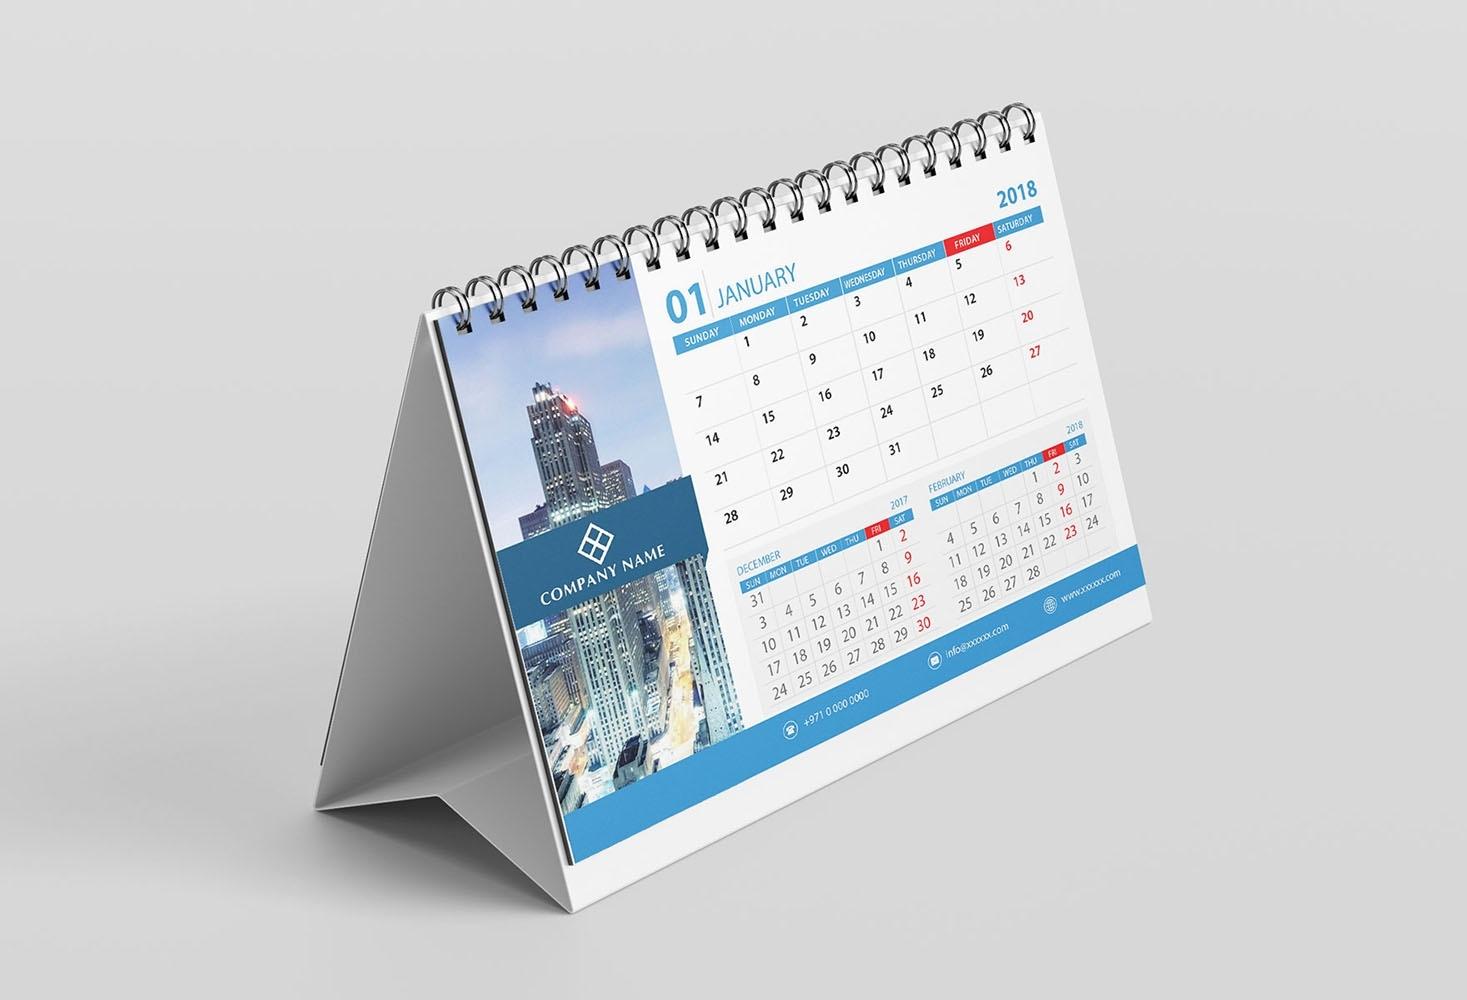 Calendars Printing In Dubai, Abu Dhabi_The Calendar Printing Company